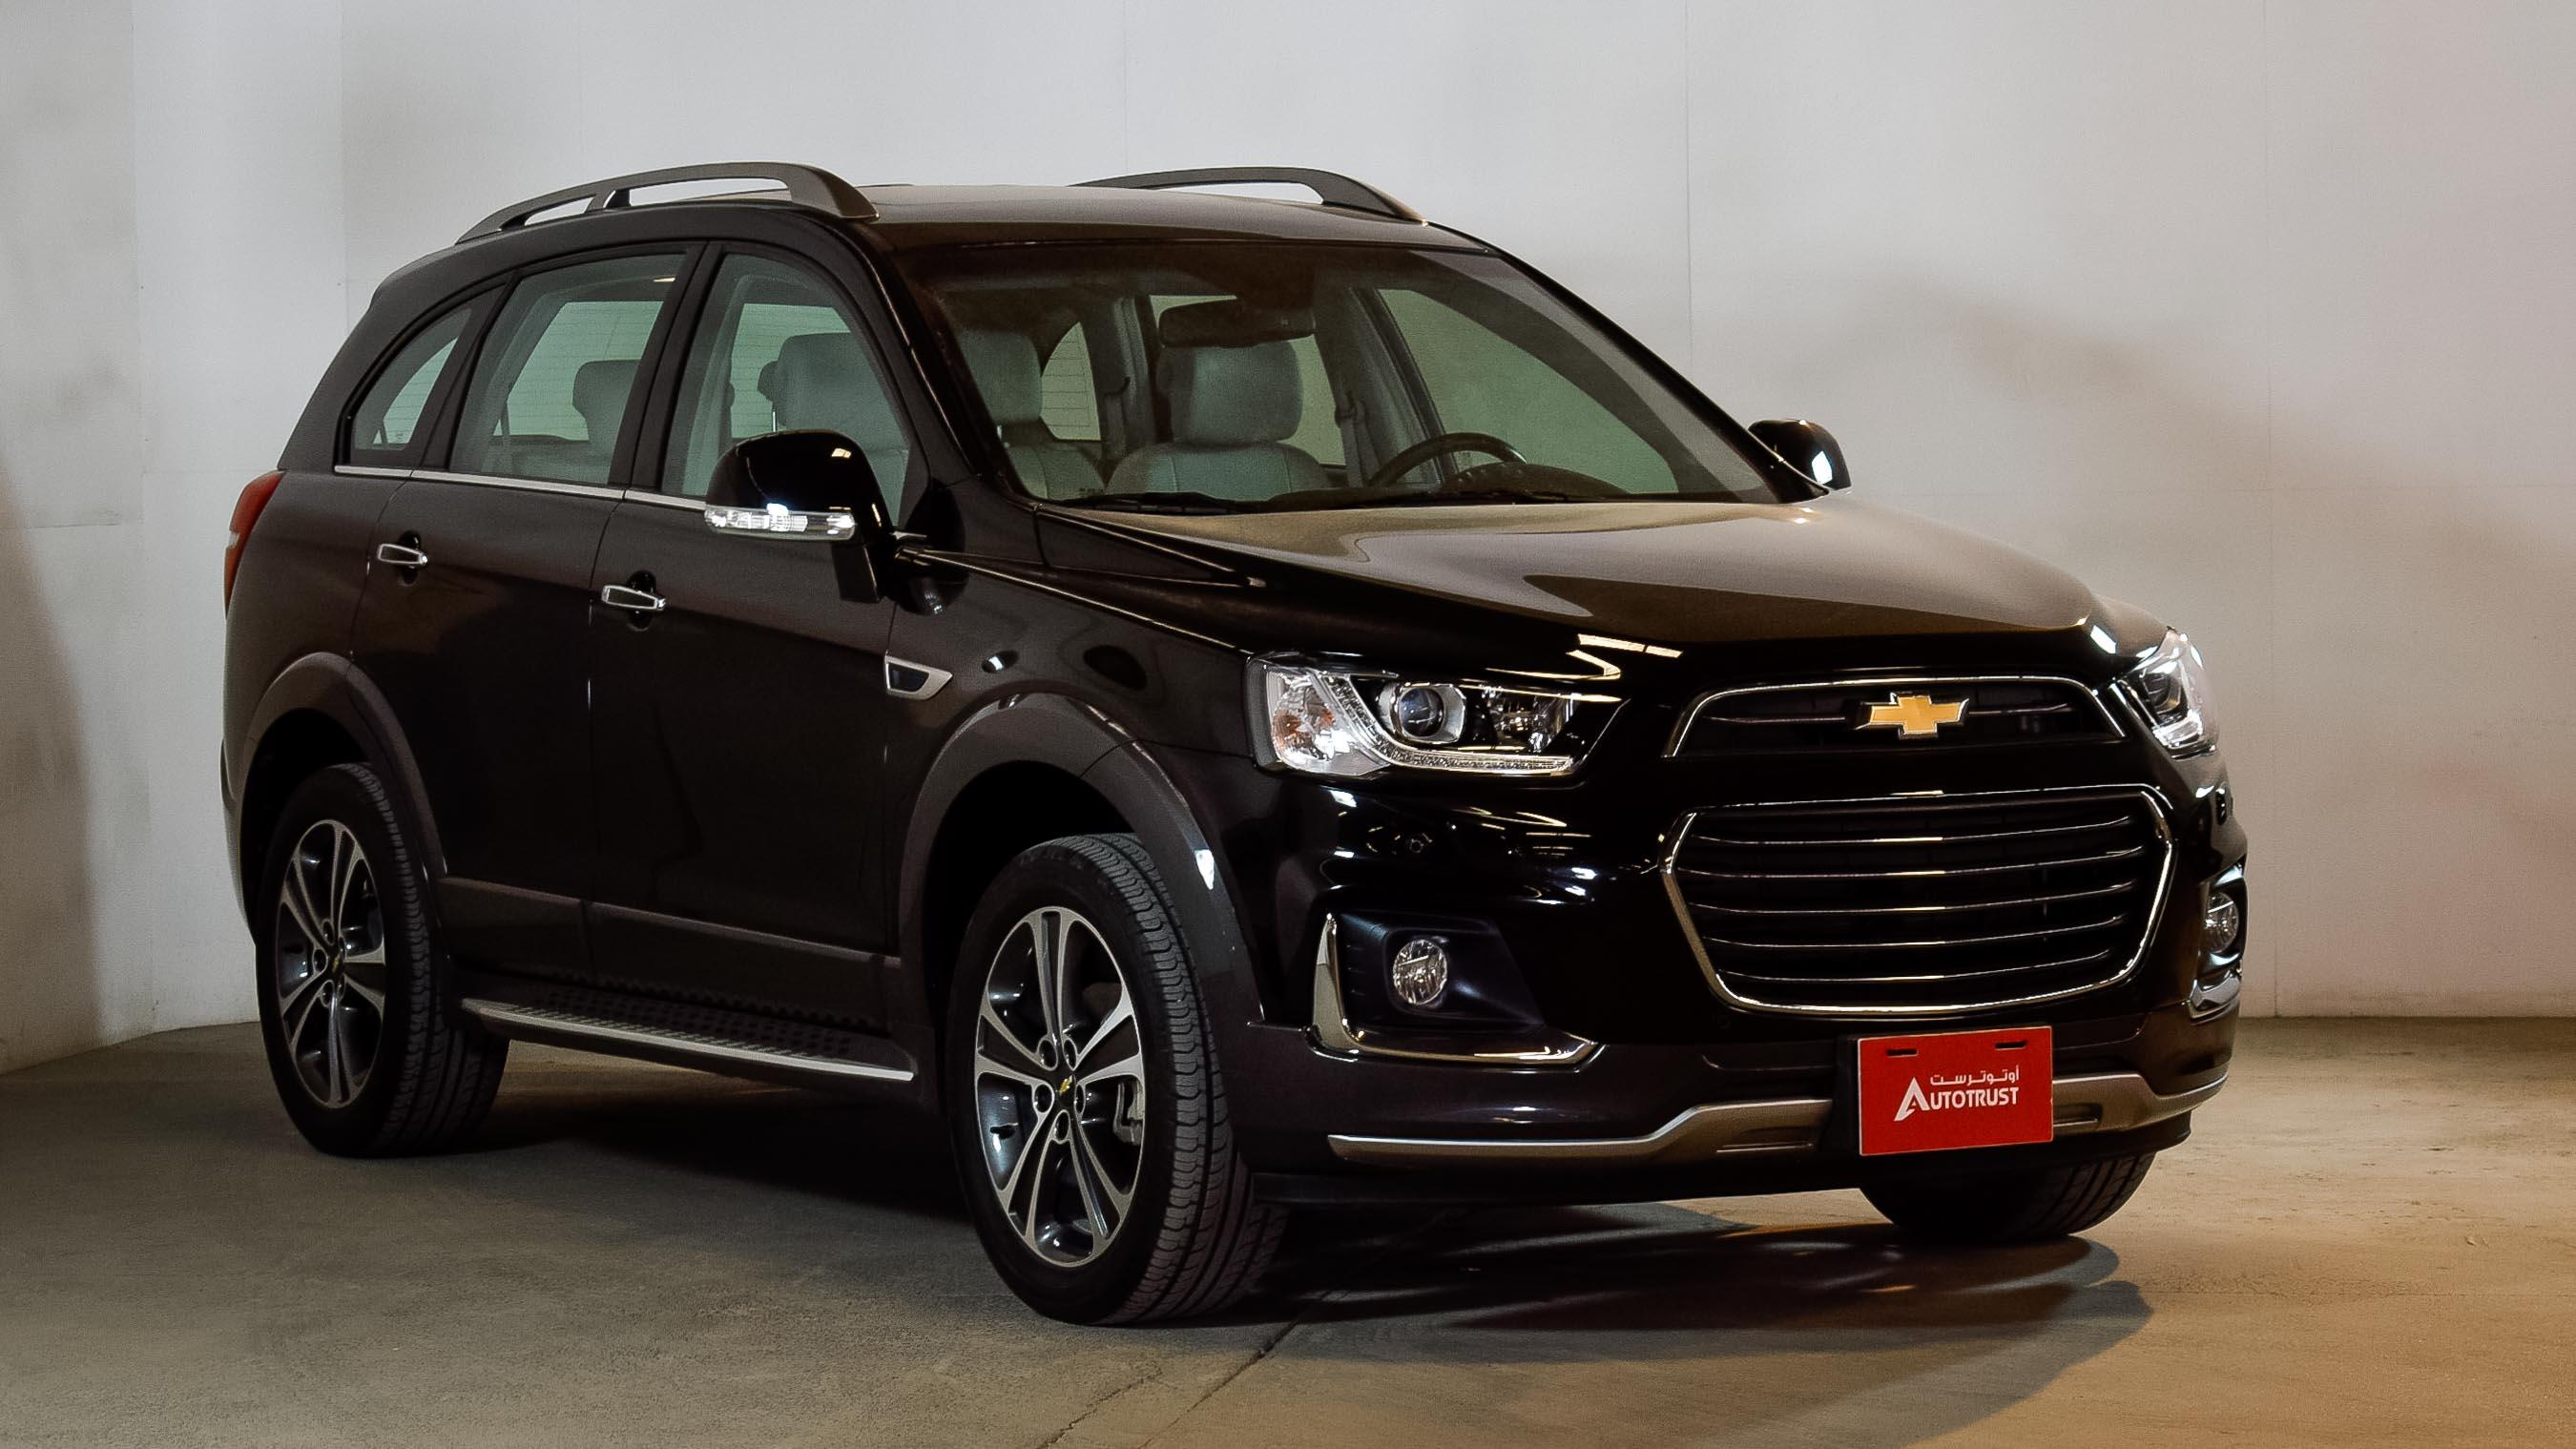 Kekurangan Chevrolet Captiva 2017 Tangguh